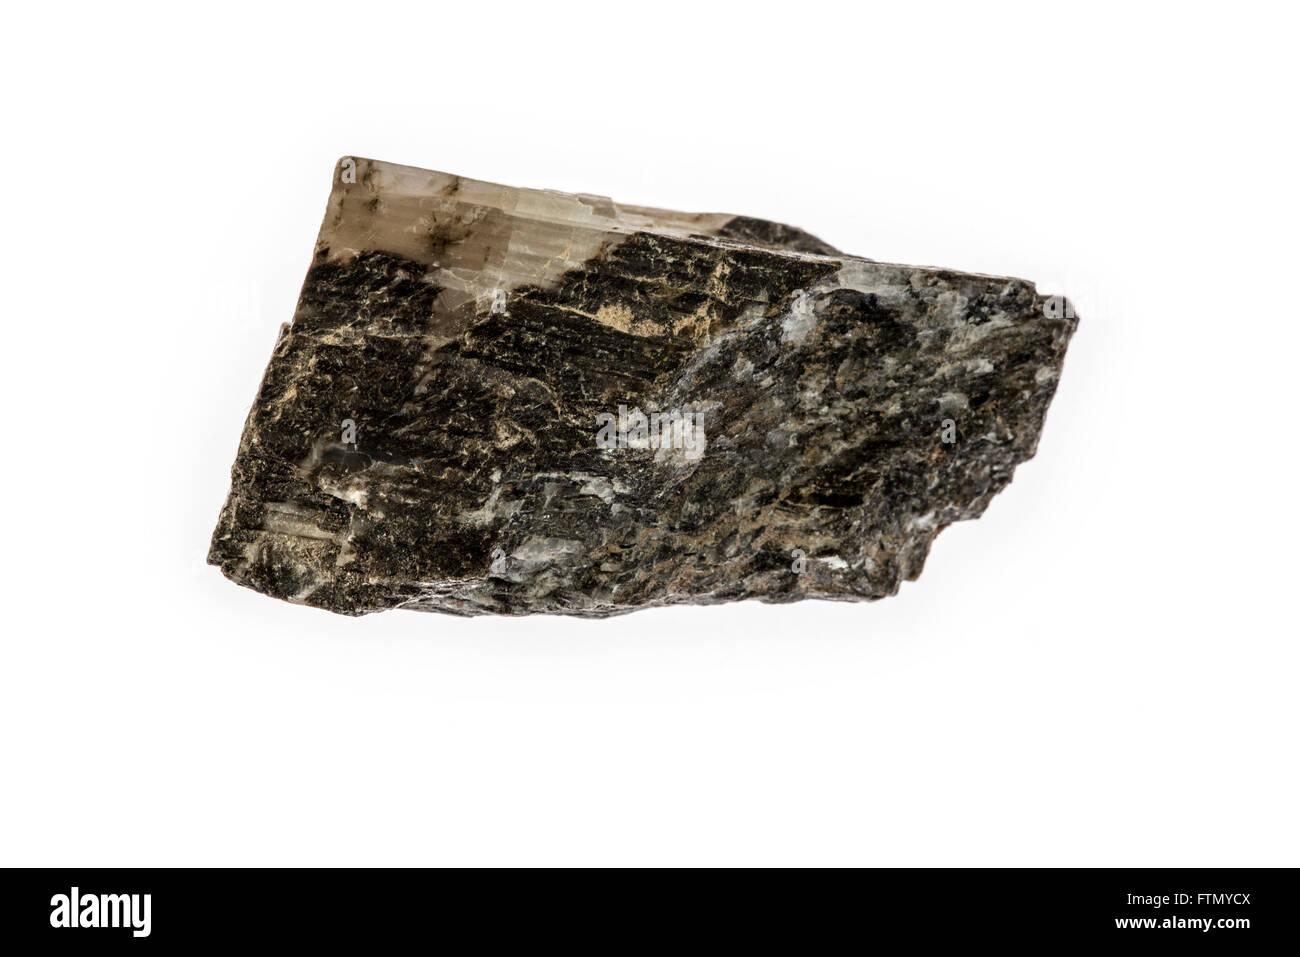 Tourmaline specimen, crystalline boron silicate mineral on white background - Stock Image